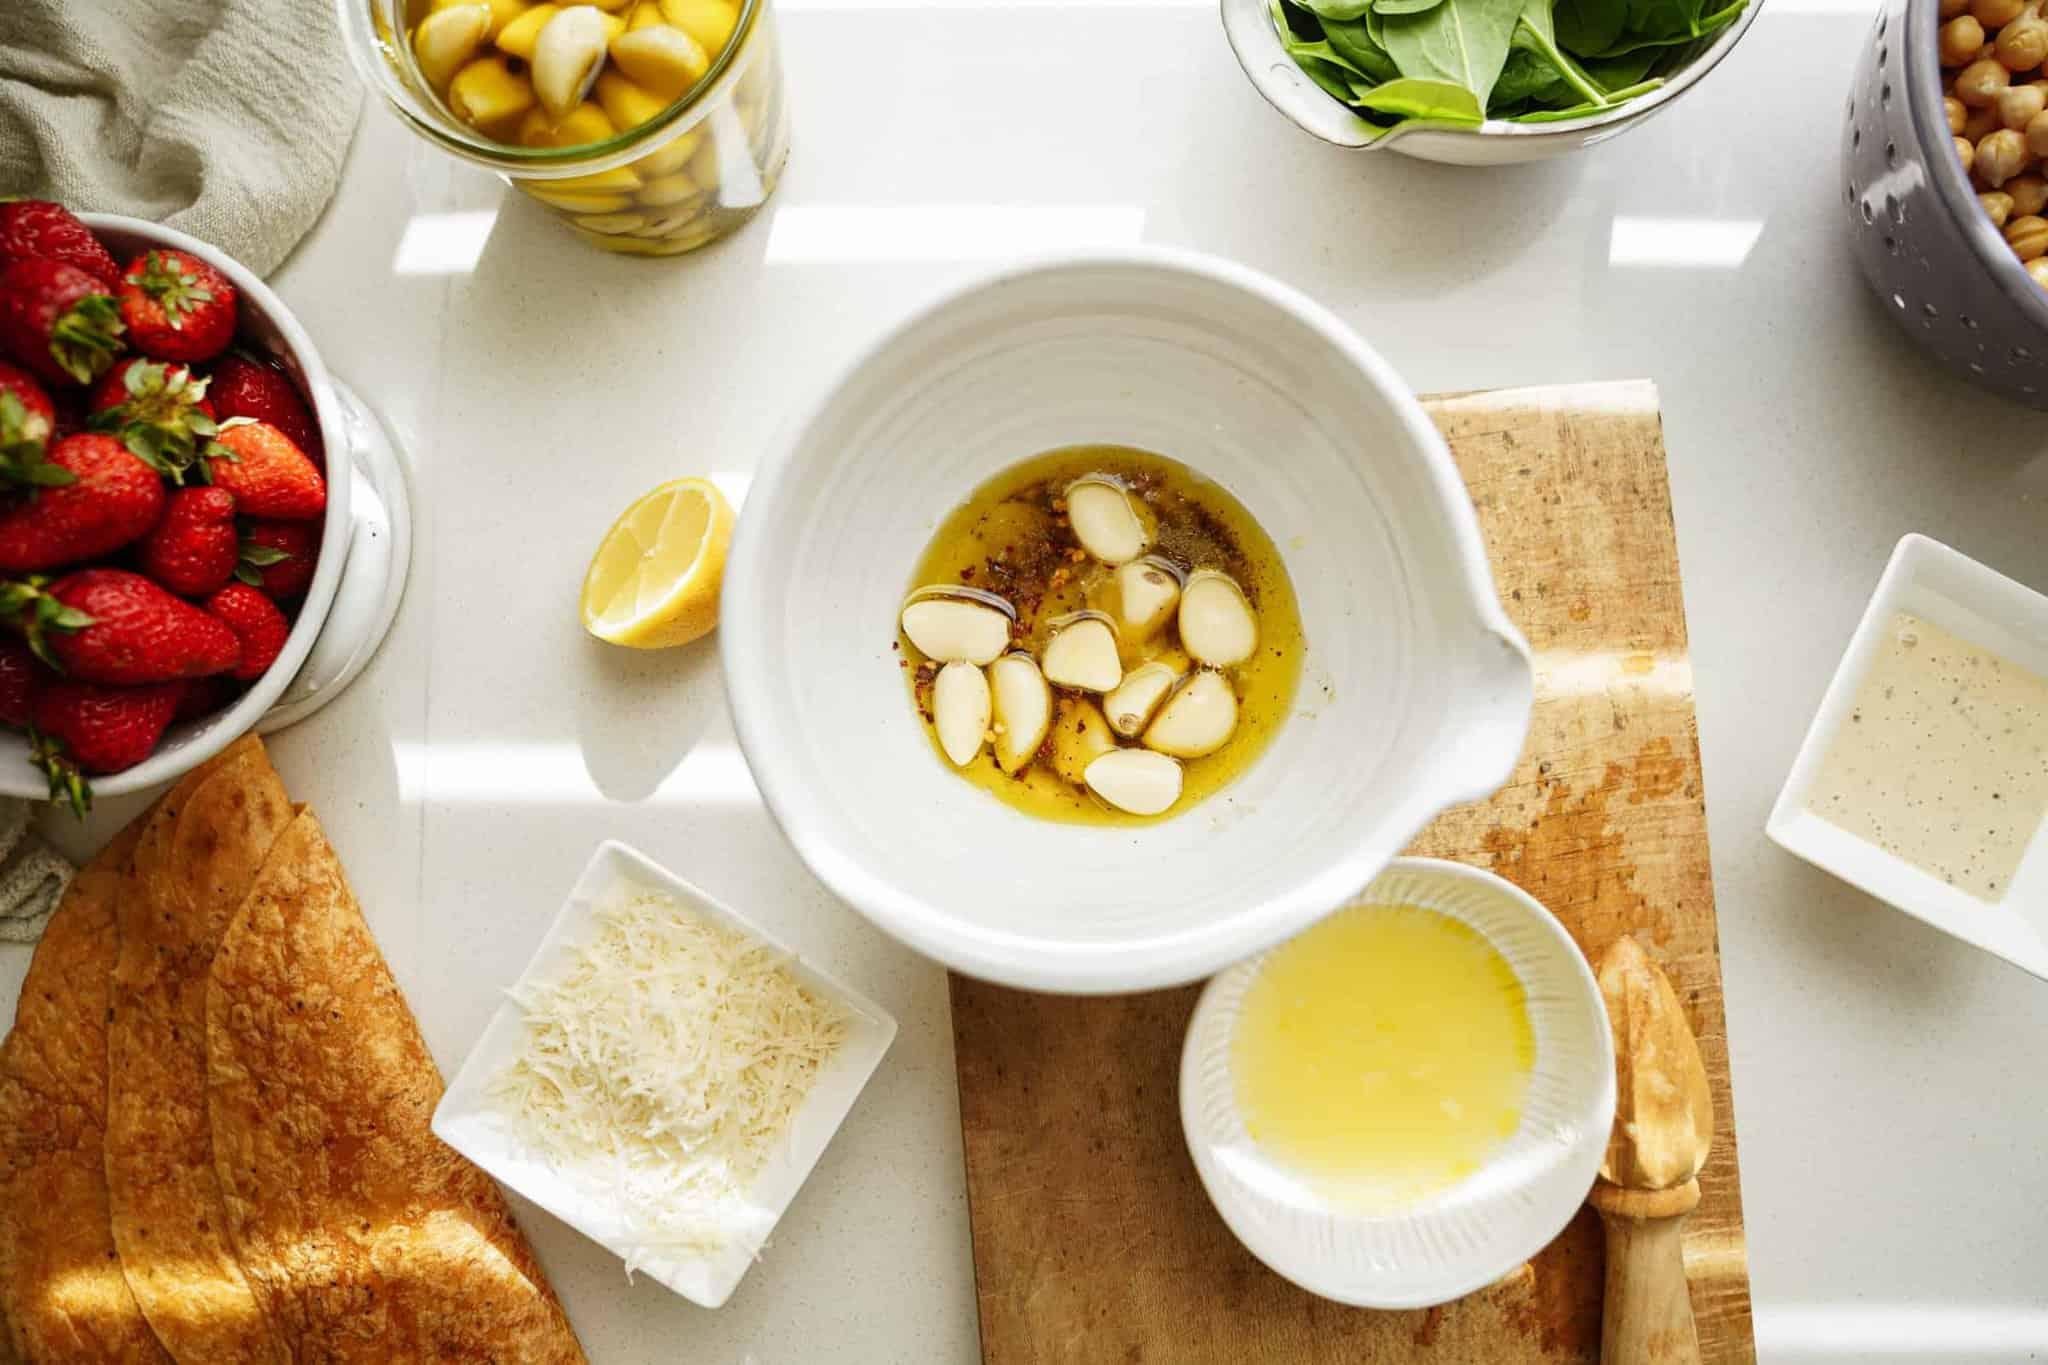 Ingredients for garlic confit for chickpea caesar salad wrap recipe